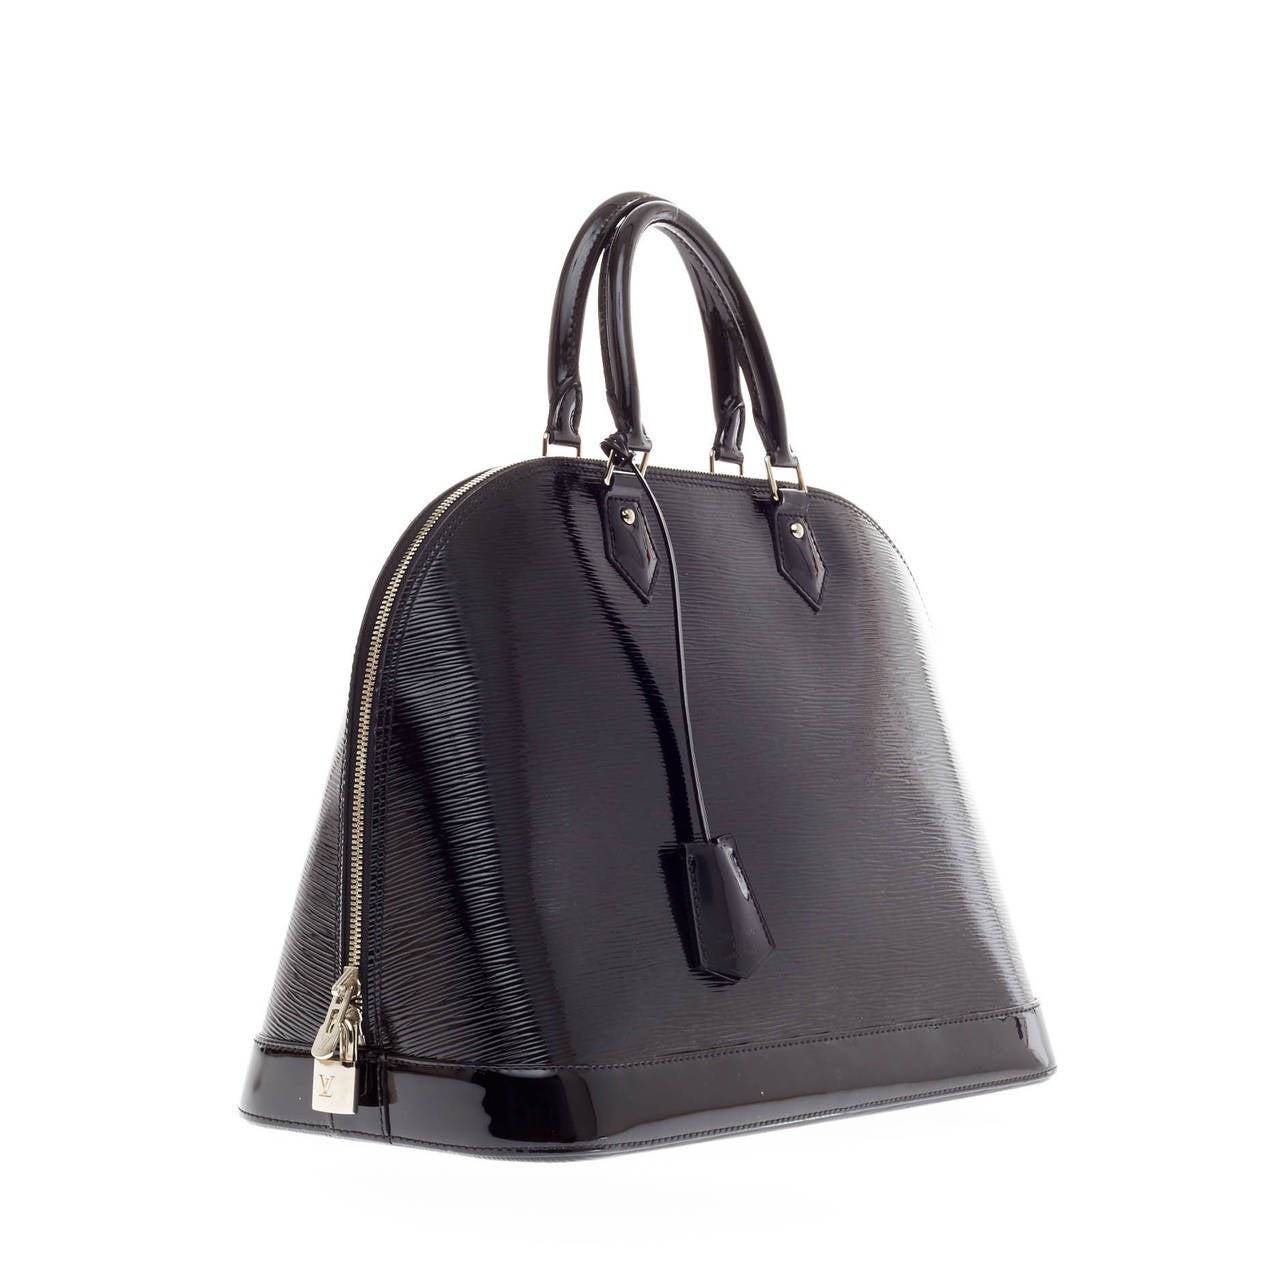 Louis Vuitton Alma Handbag Electric Epi Leather Gm aIa7n